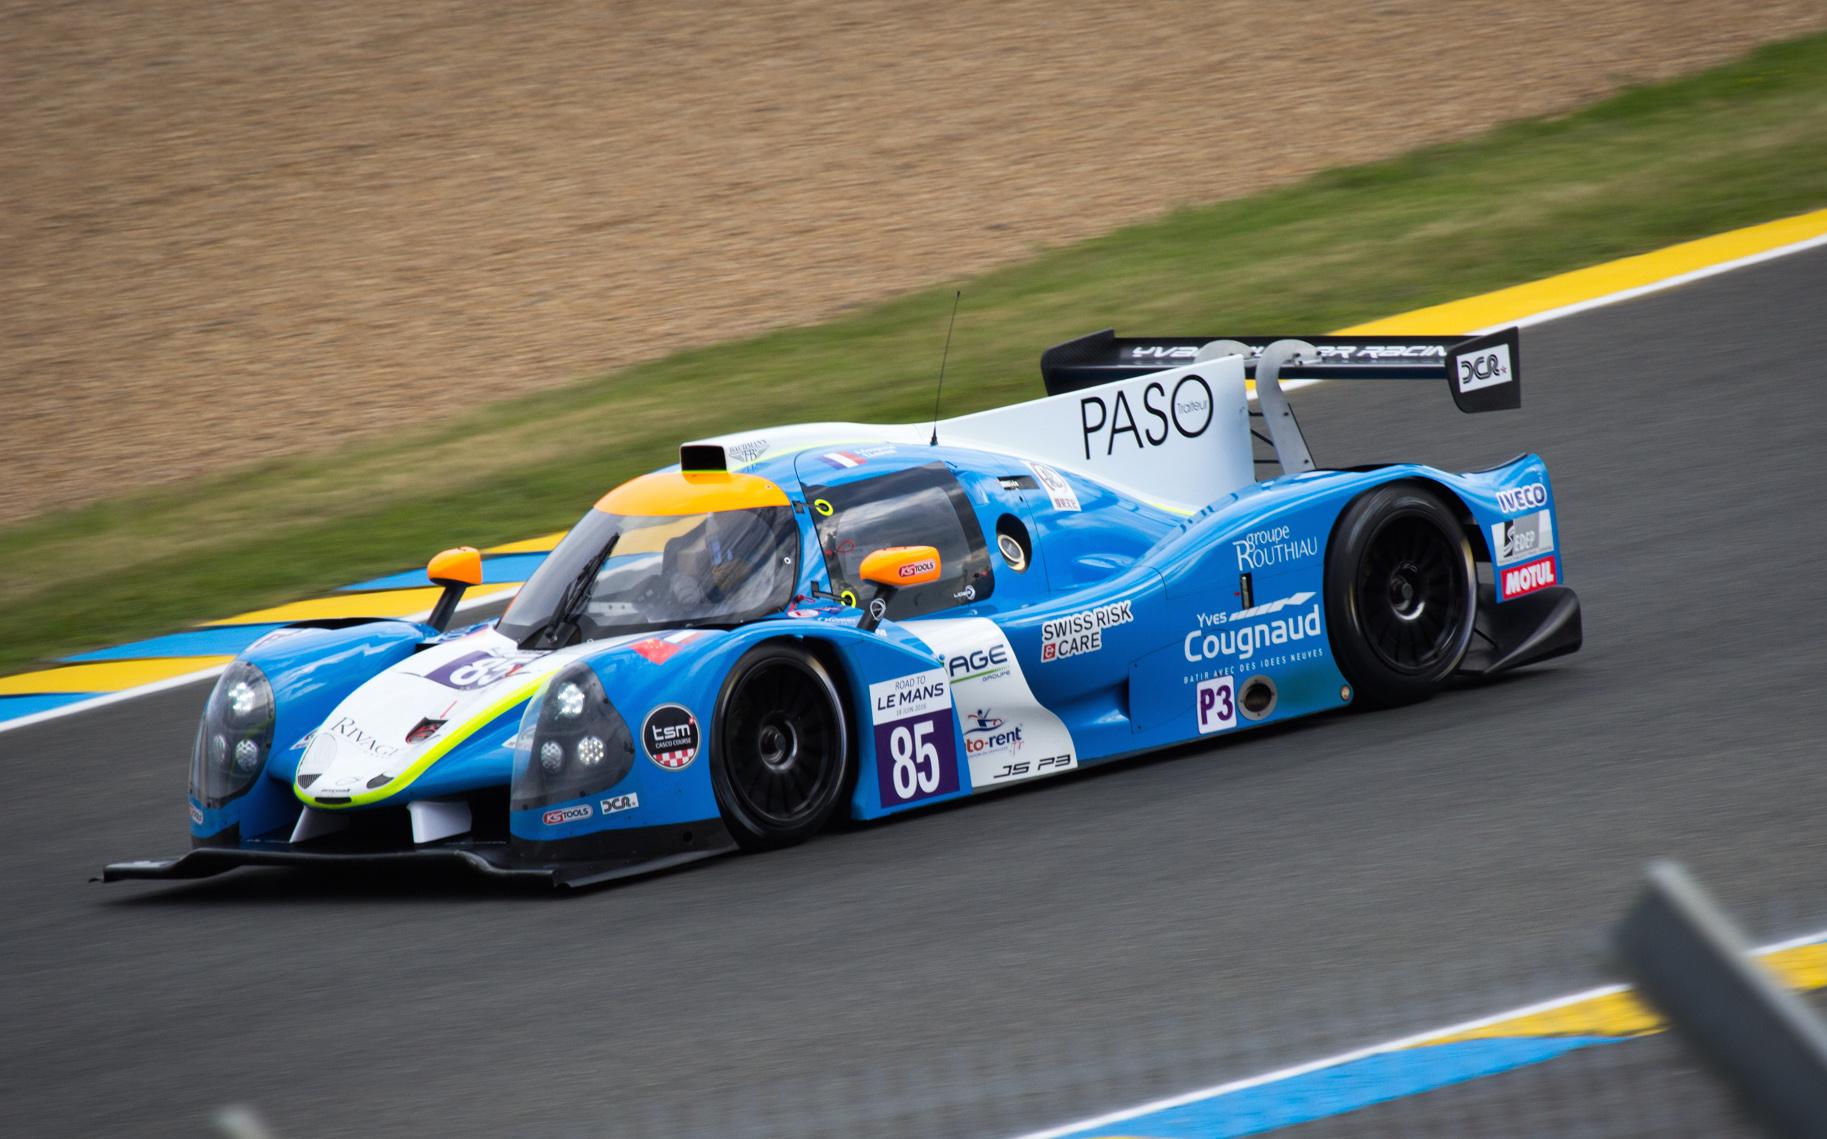 صور سيارات سباق , اجمل سيارات سباق